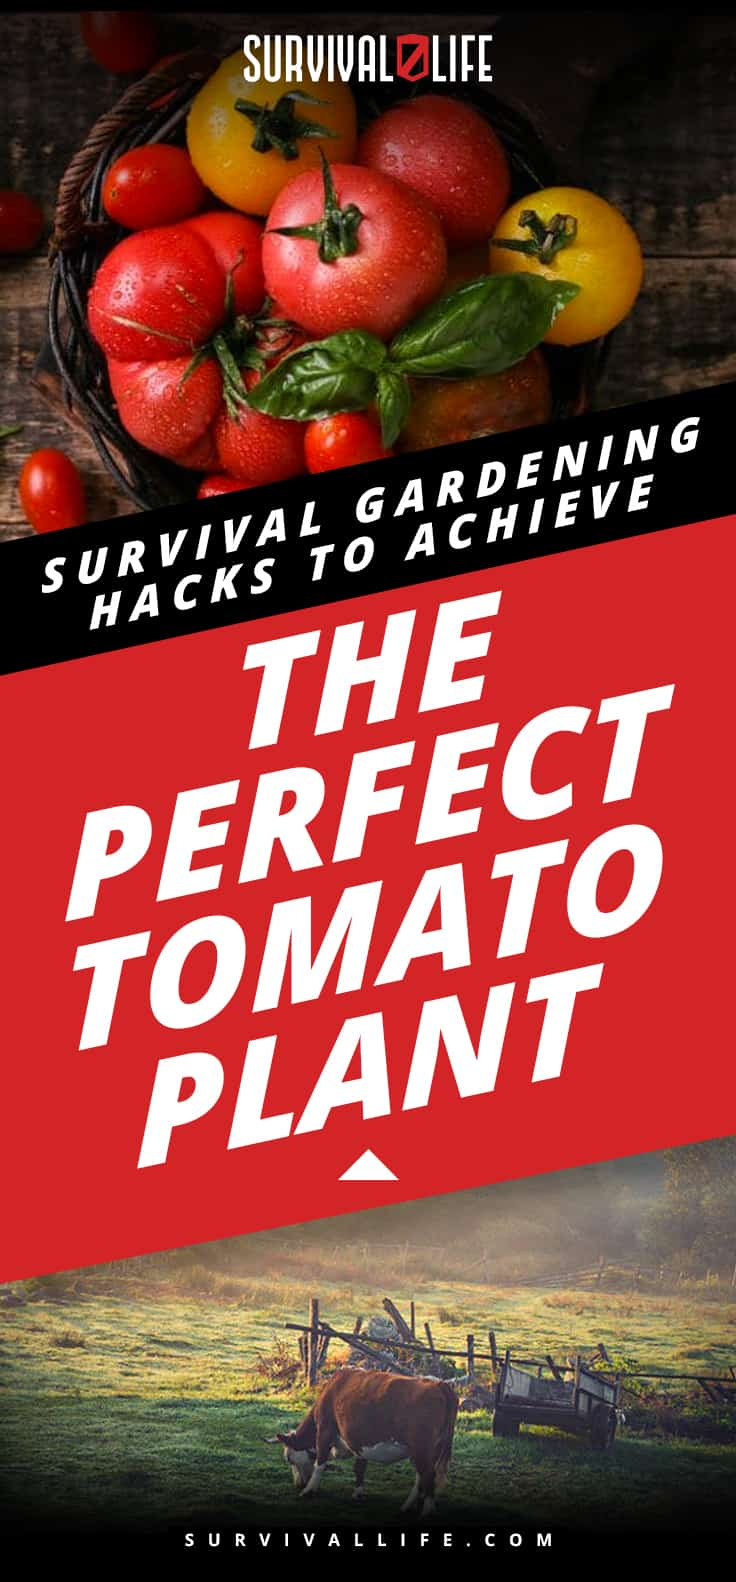 Survival Gardening Hacks To Achieve The Perfect Tomato Plant